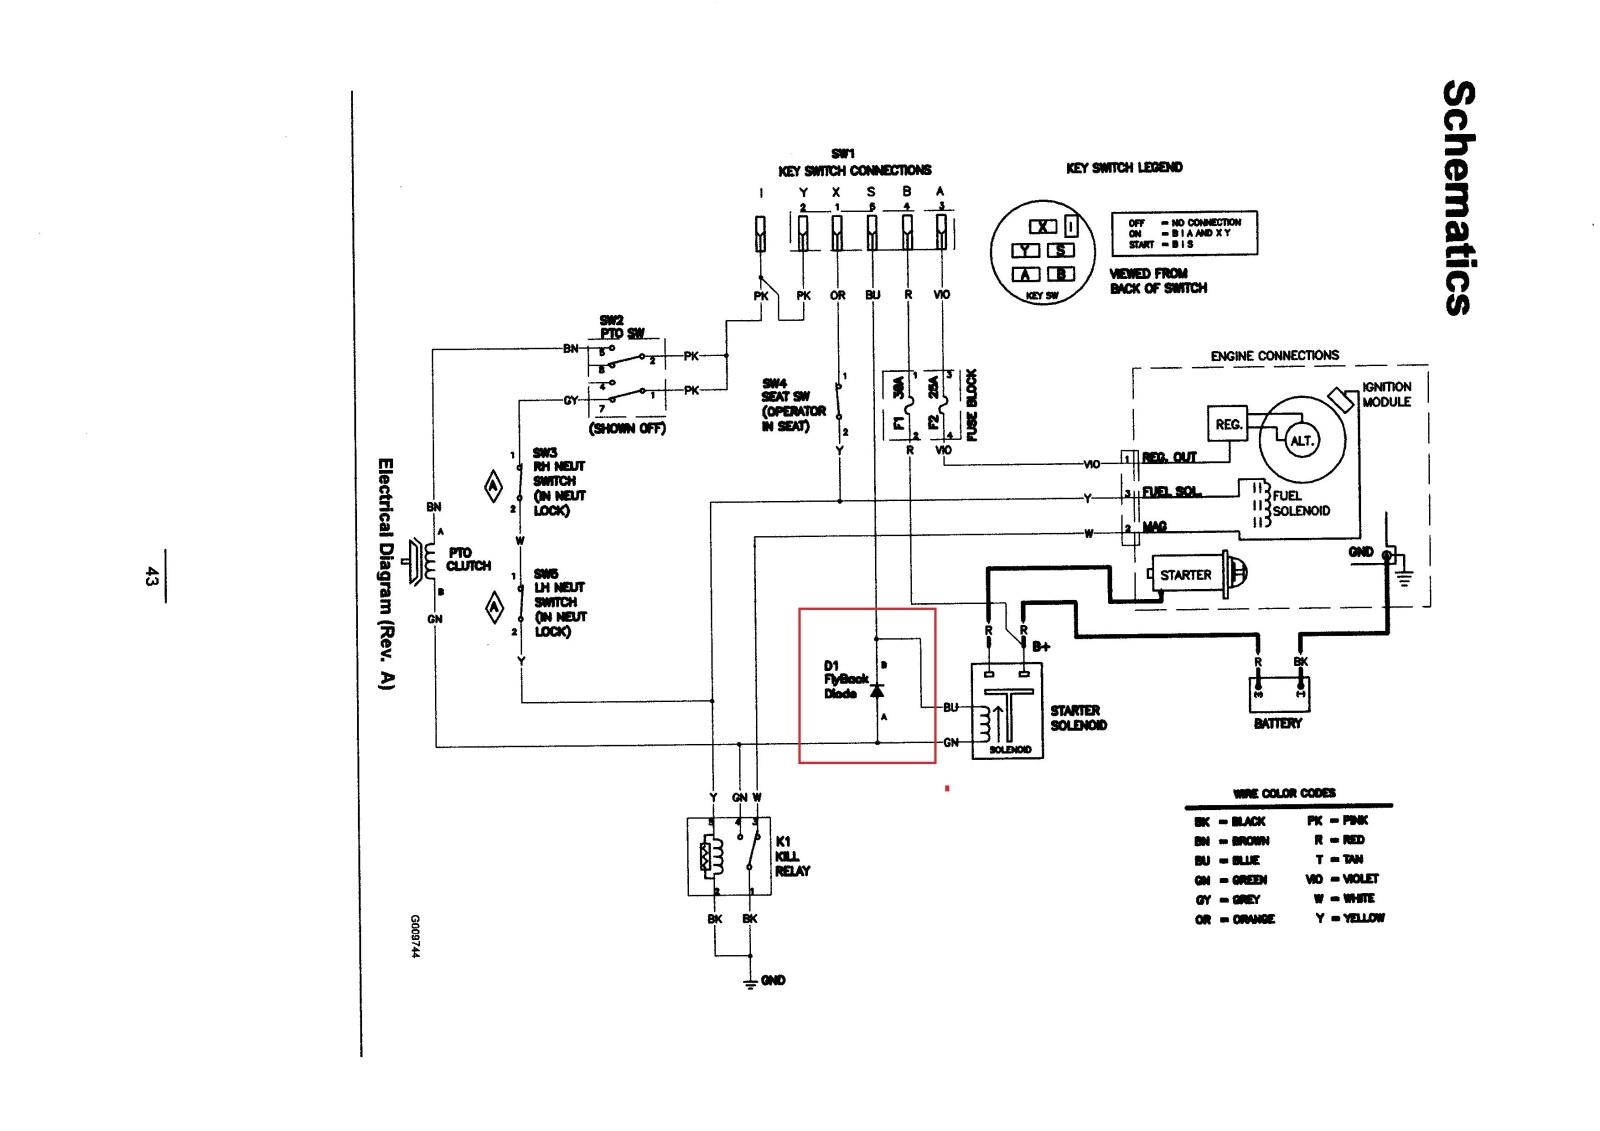 lx279 wiring diagram general data wiring diagram jpg